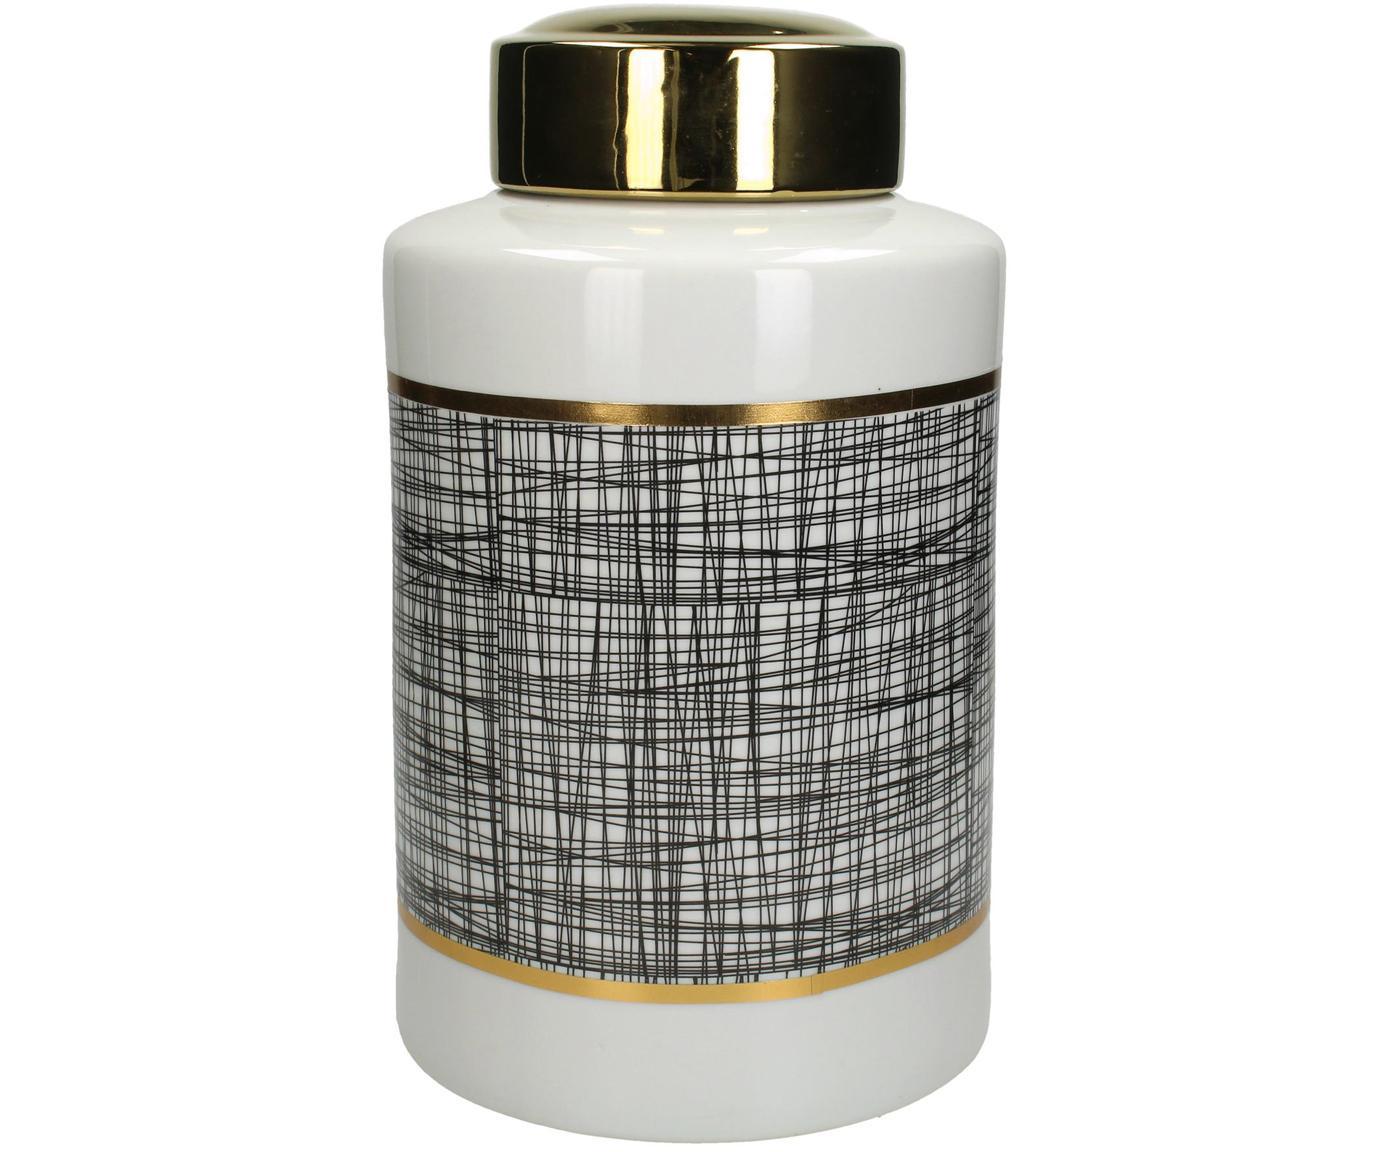 Opbergpot Lines, Porselein, Zwart, wit, goudkleurig, Ø 20 x H 40 cm